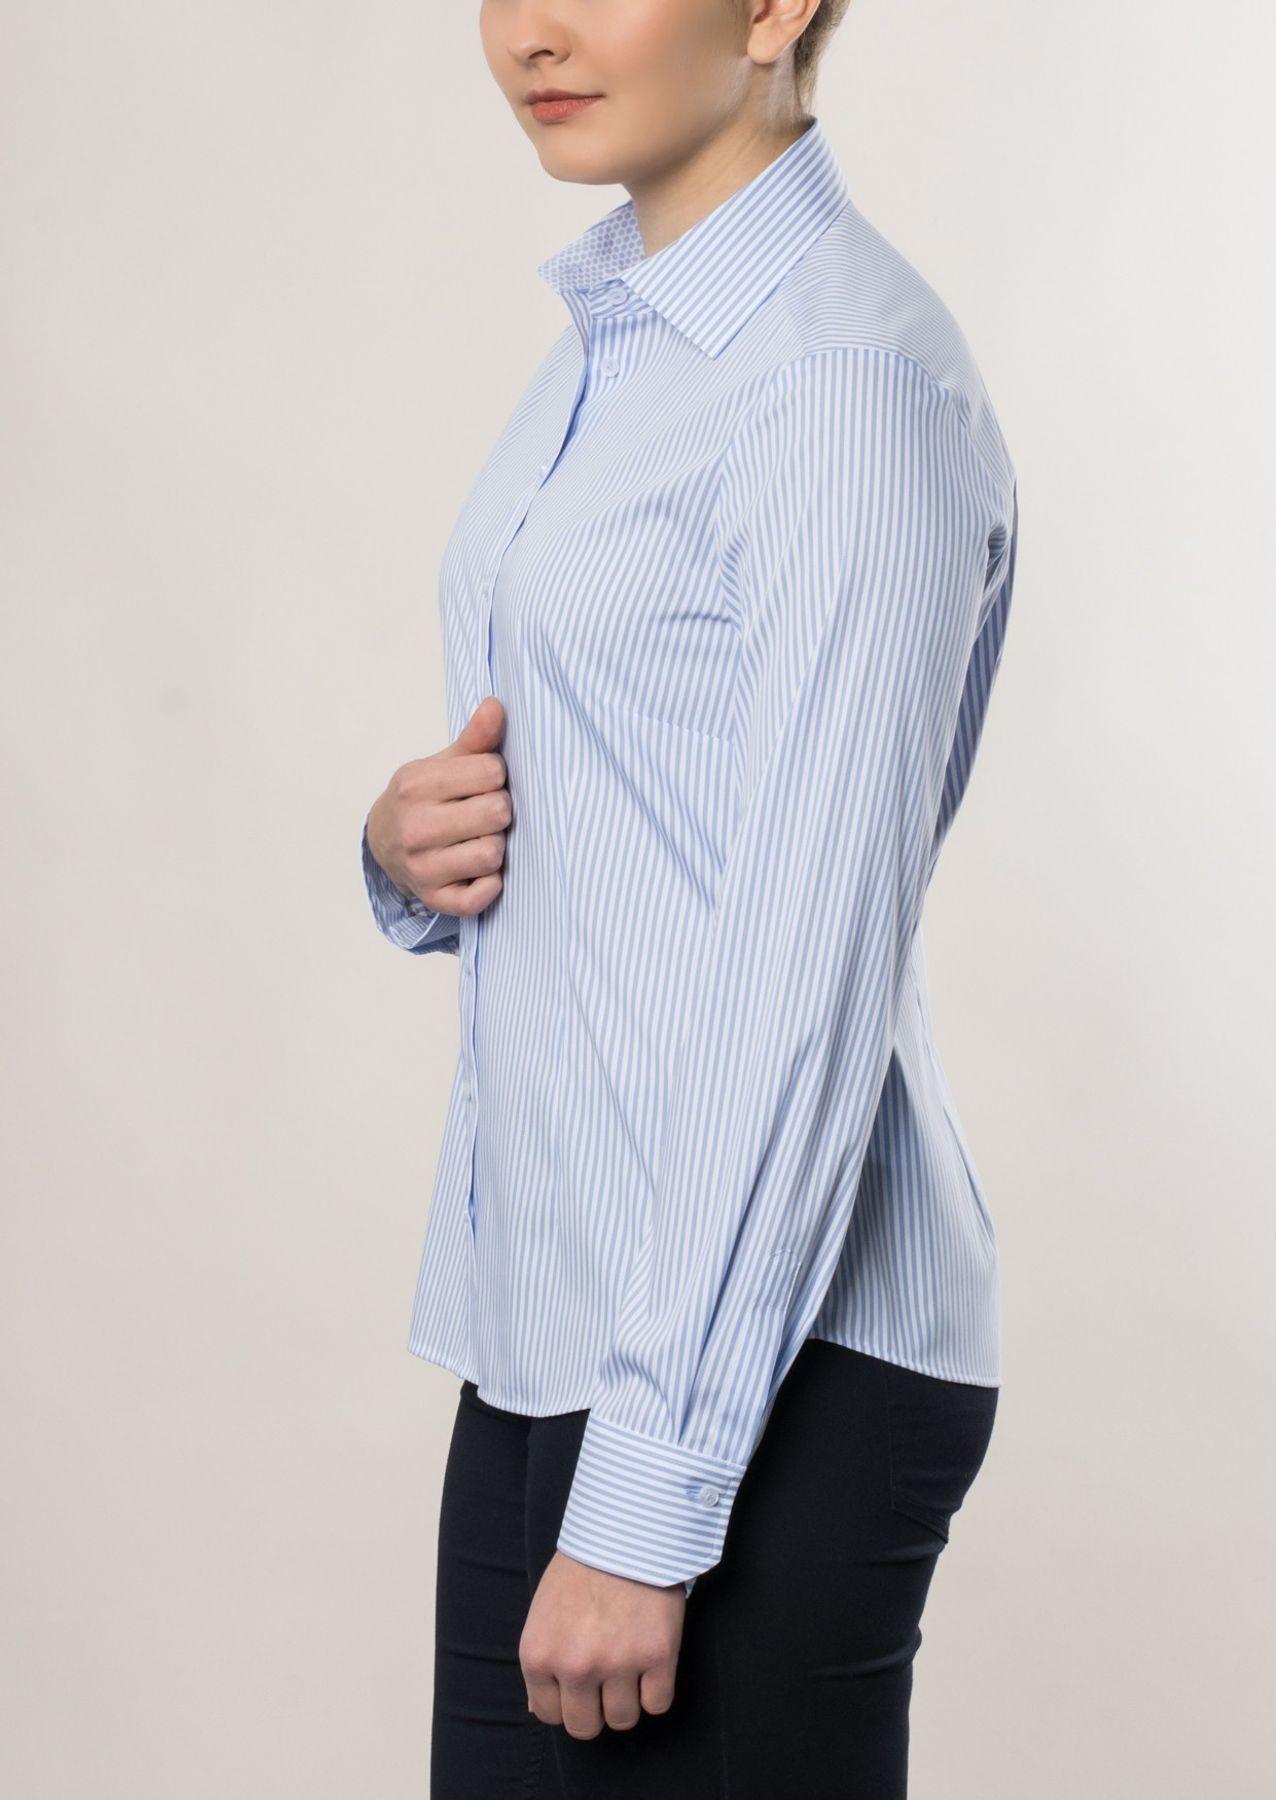 Eterna -  Comfort-Fit - Damen Langarm Bluse in Dunkelblau/ Weiß gestreift  (6017 D390) – Bild 7